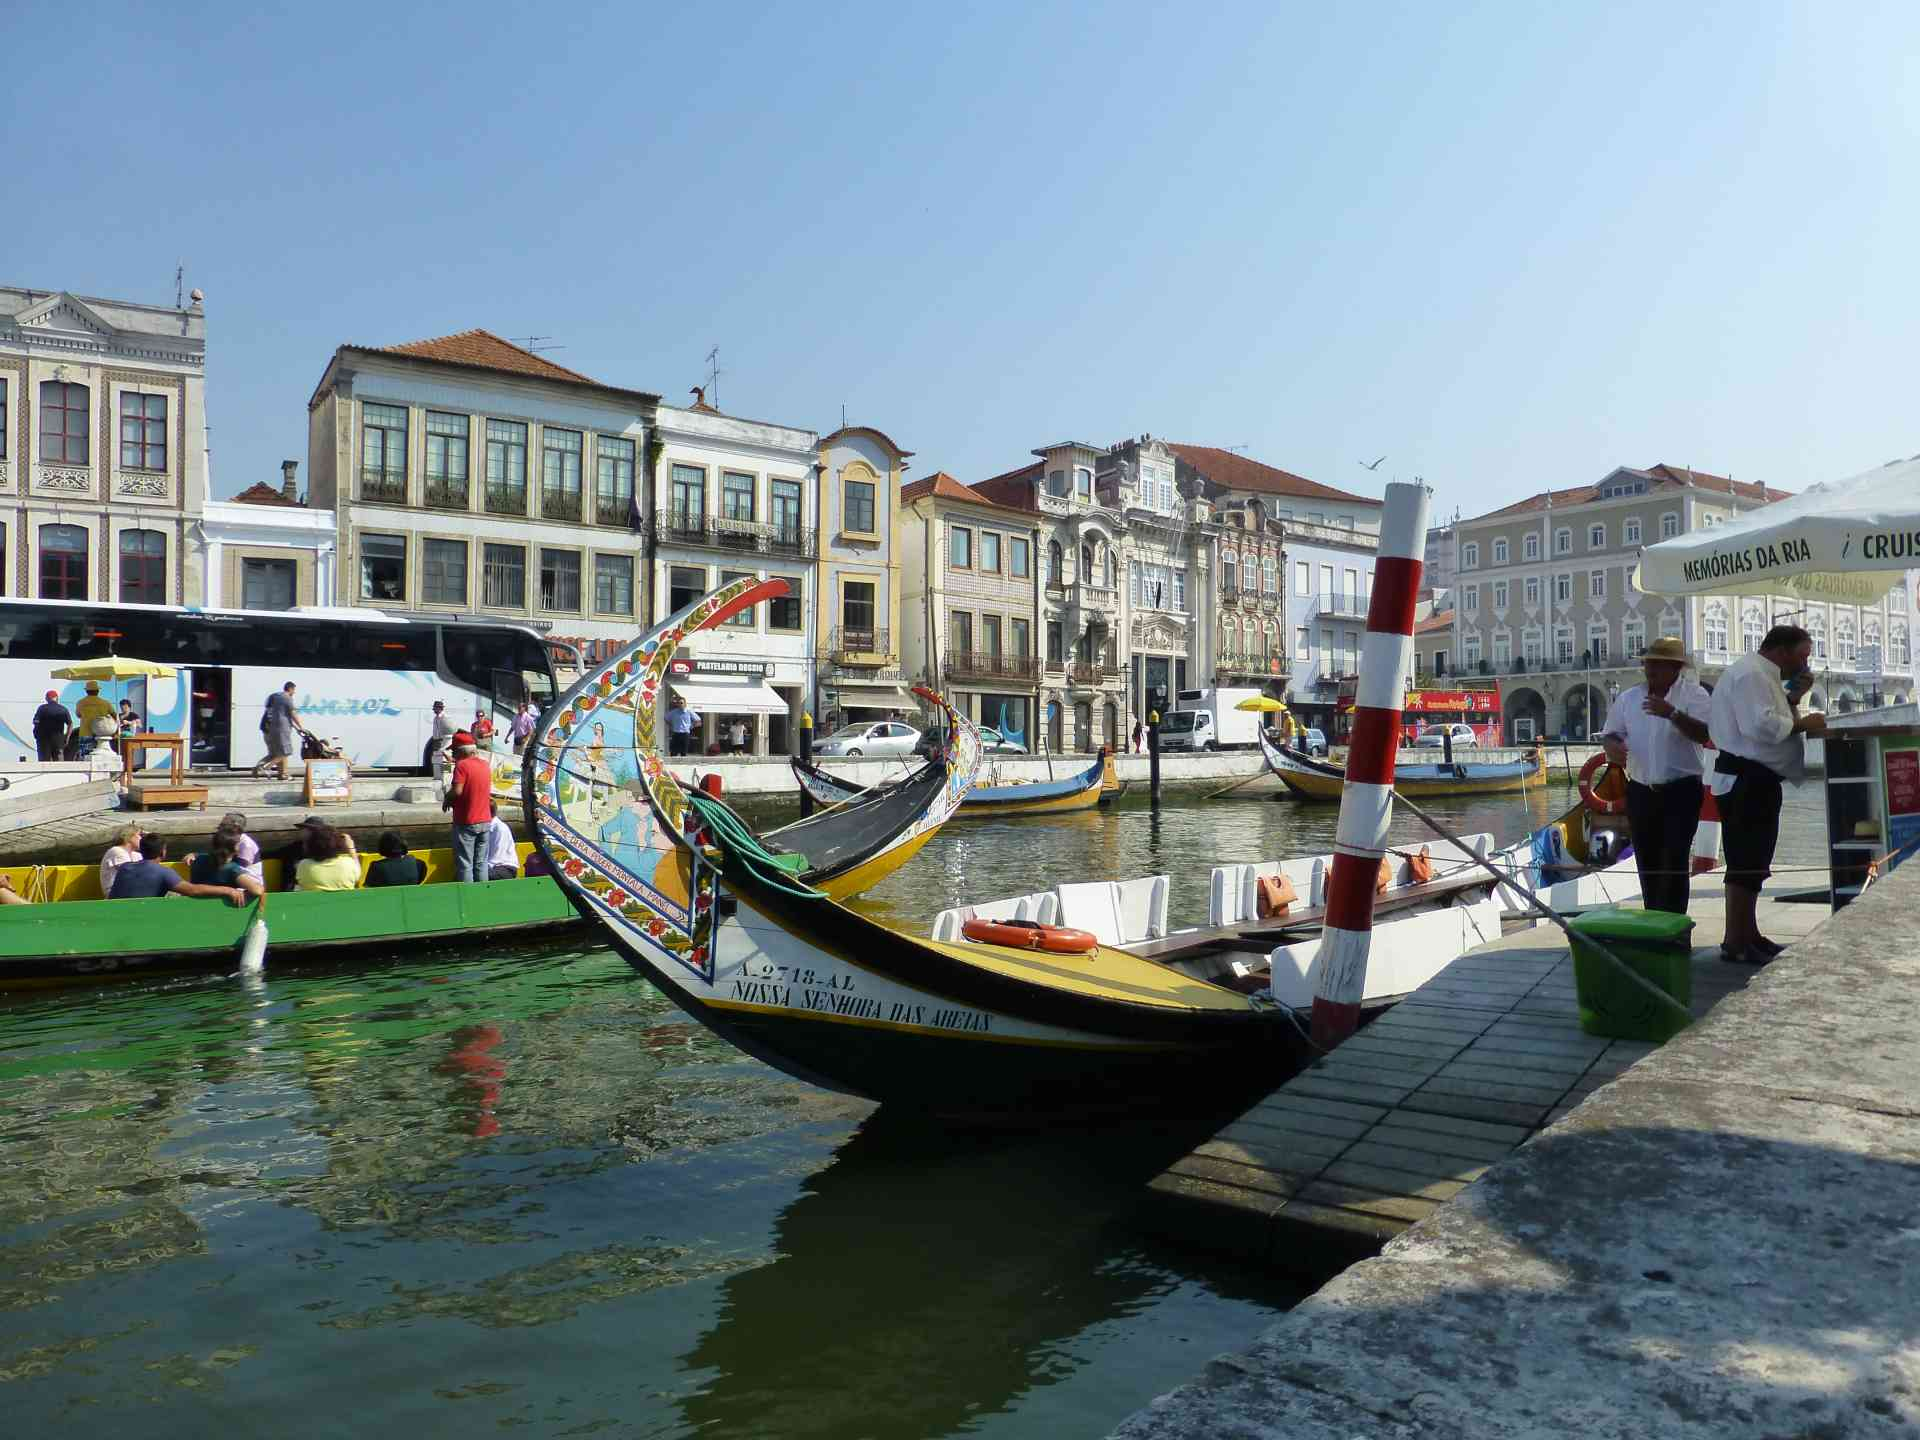 Averio, Portugal by Dennis Bunnik